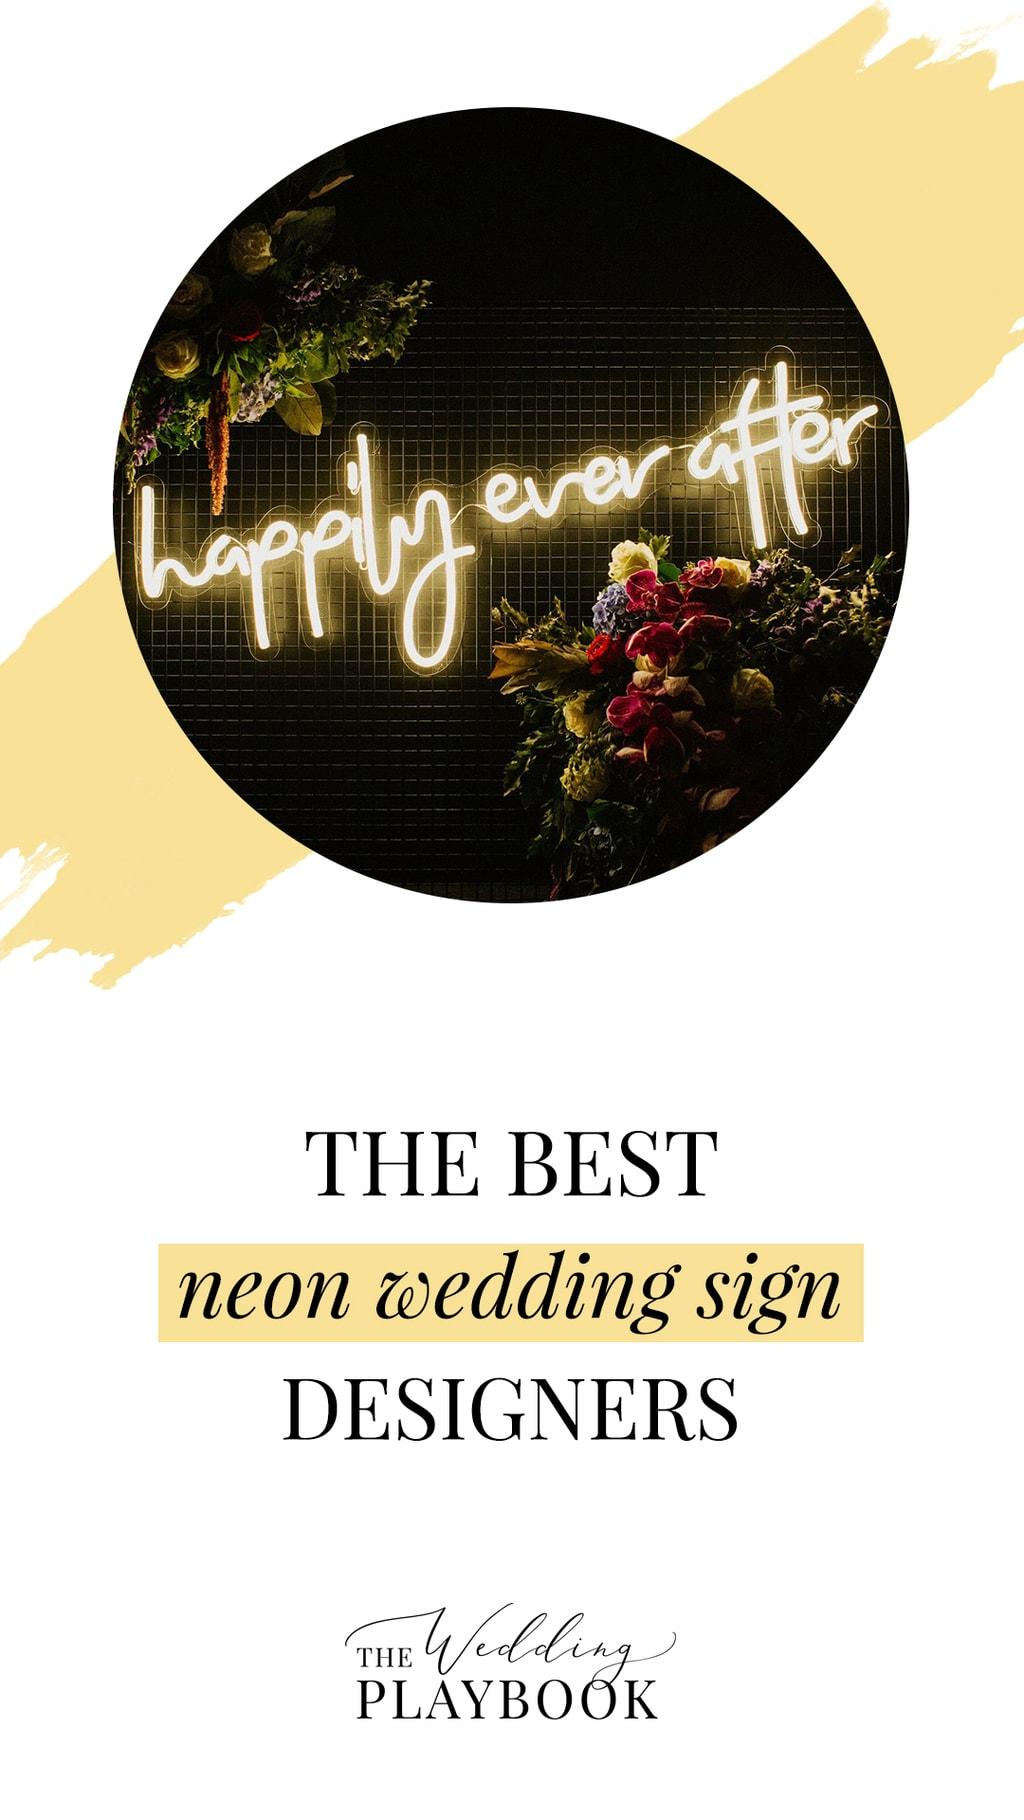 The Best Neon Wedding Sign Designers